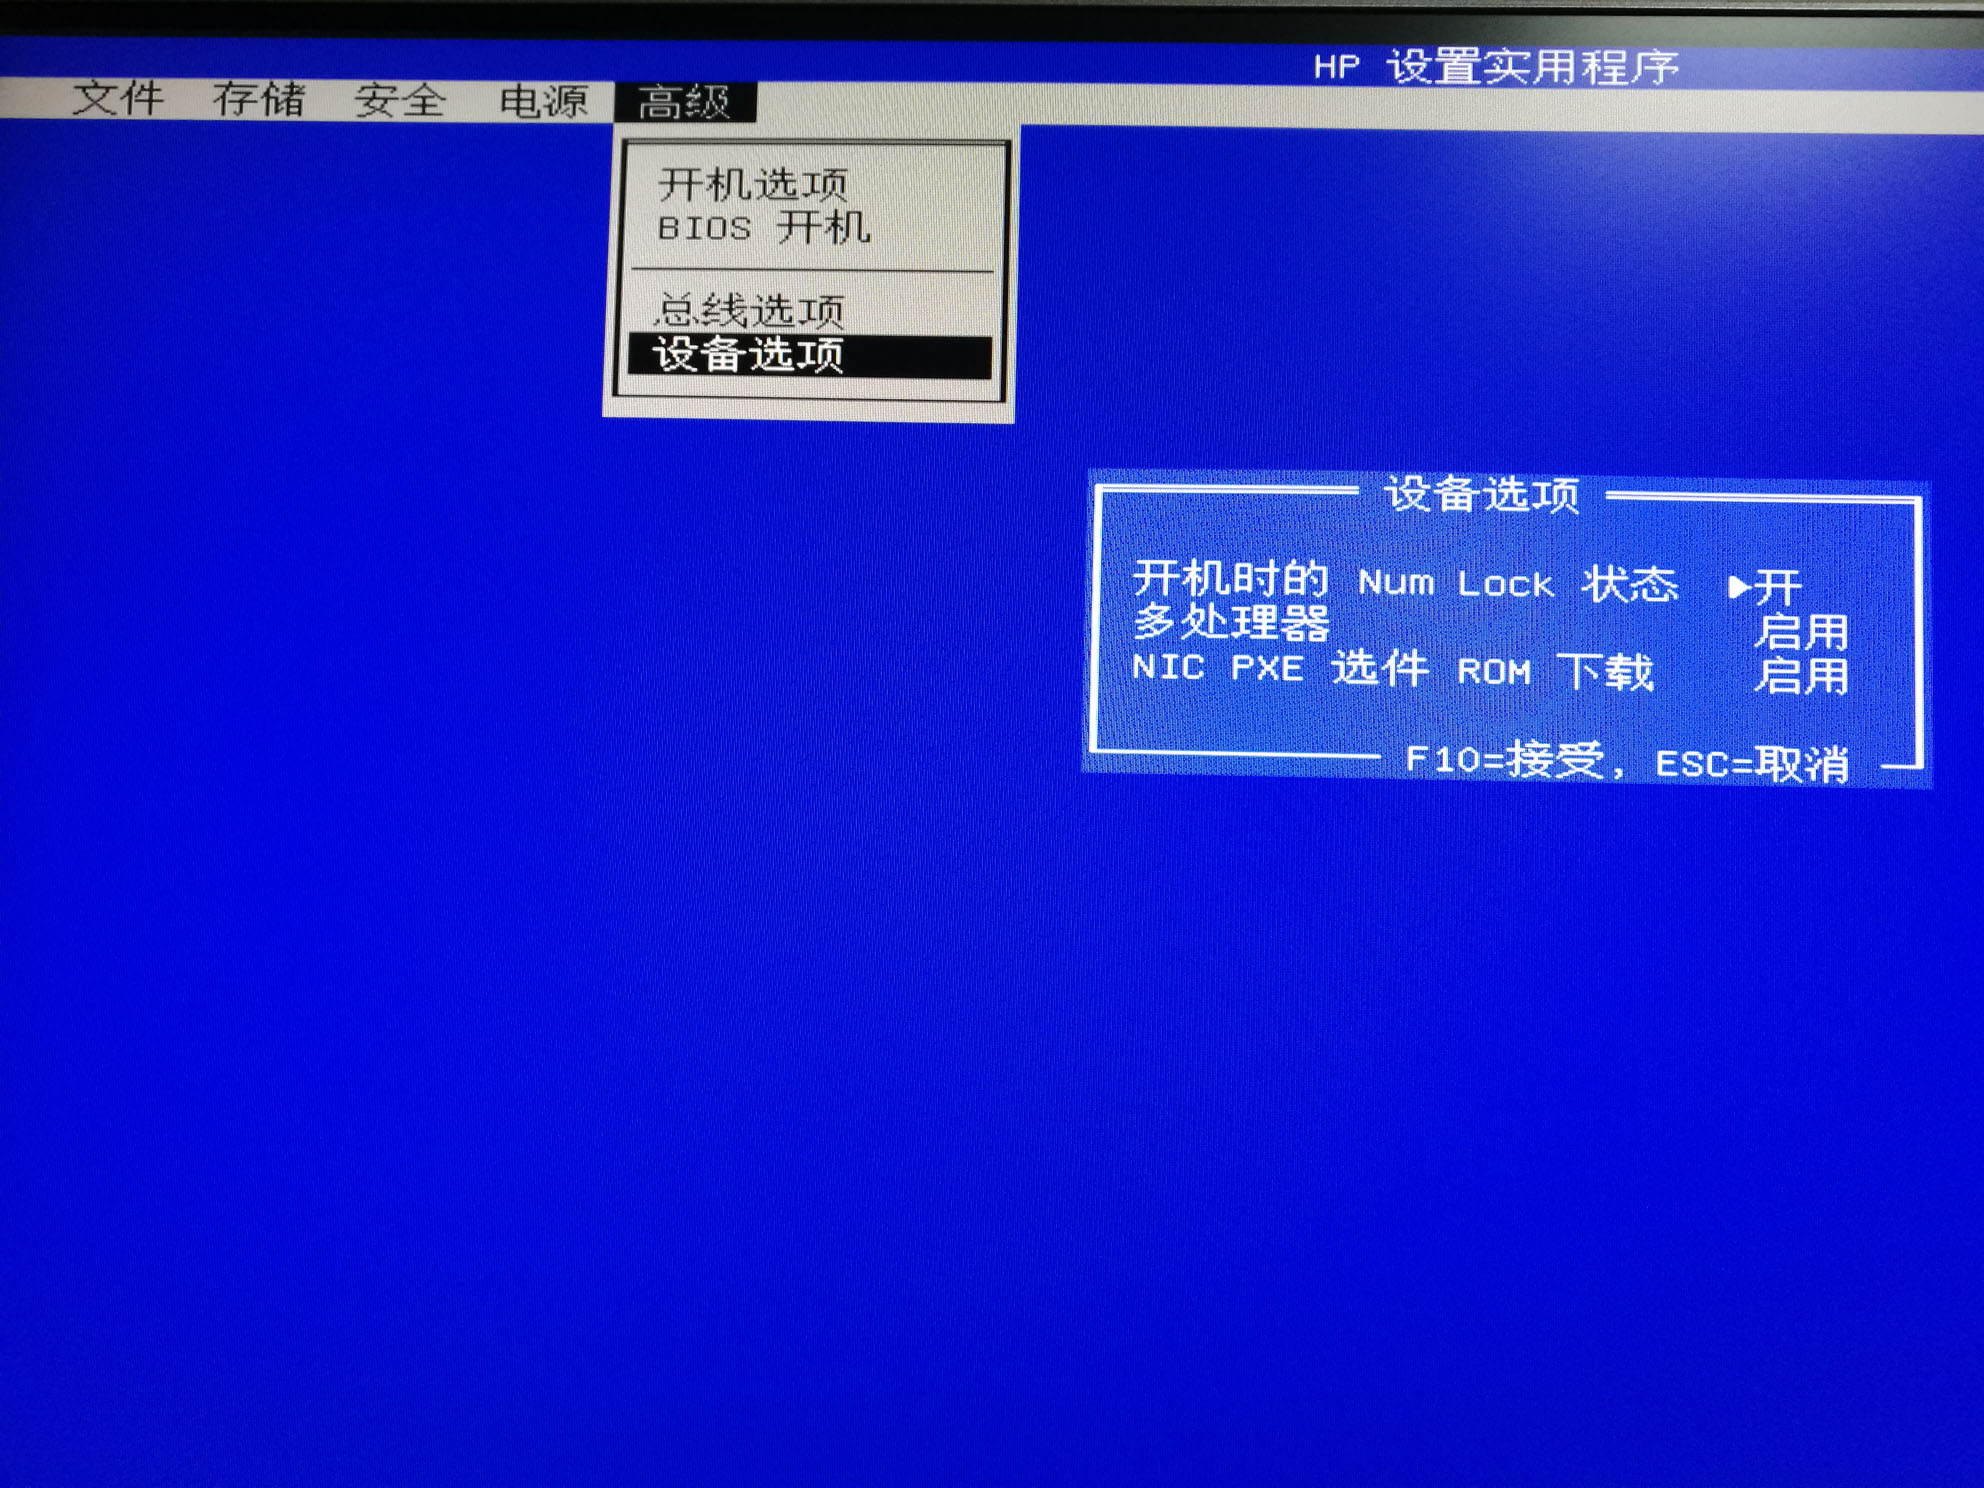 OMEN by HP Desktop PC 880-199cn怎么开启核显- 惠普支持社区- 905018